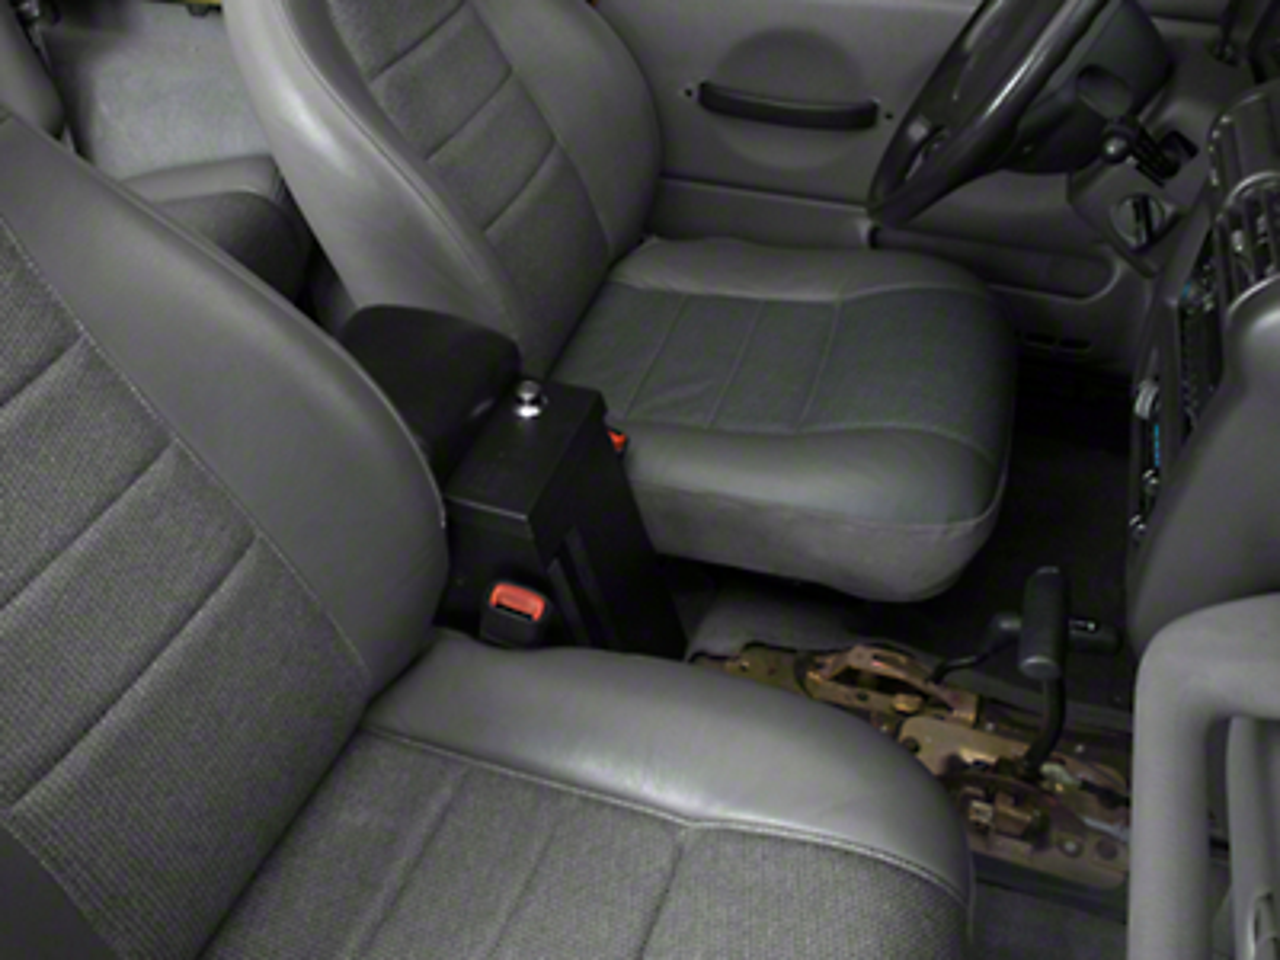 Tuffy Series II Rear Half Security Console - Black (97-06 Jeep Wrangler TJ)